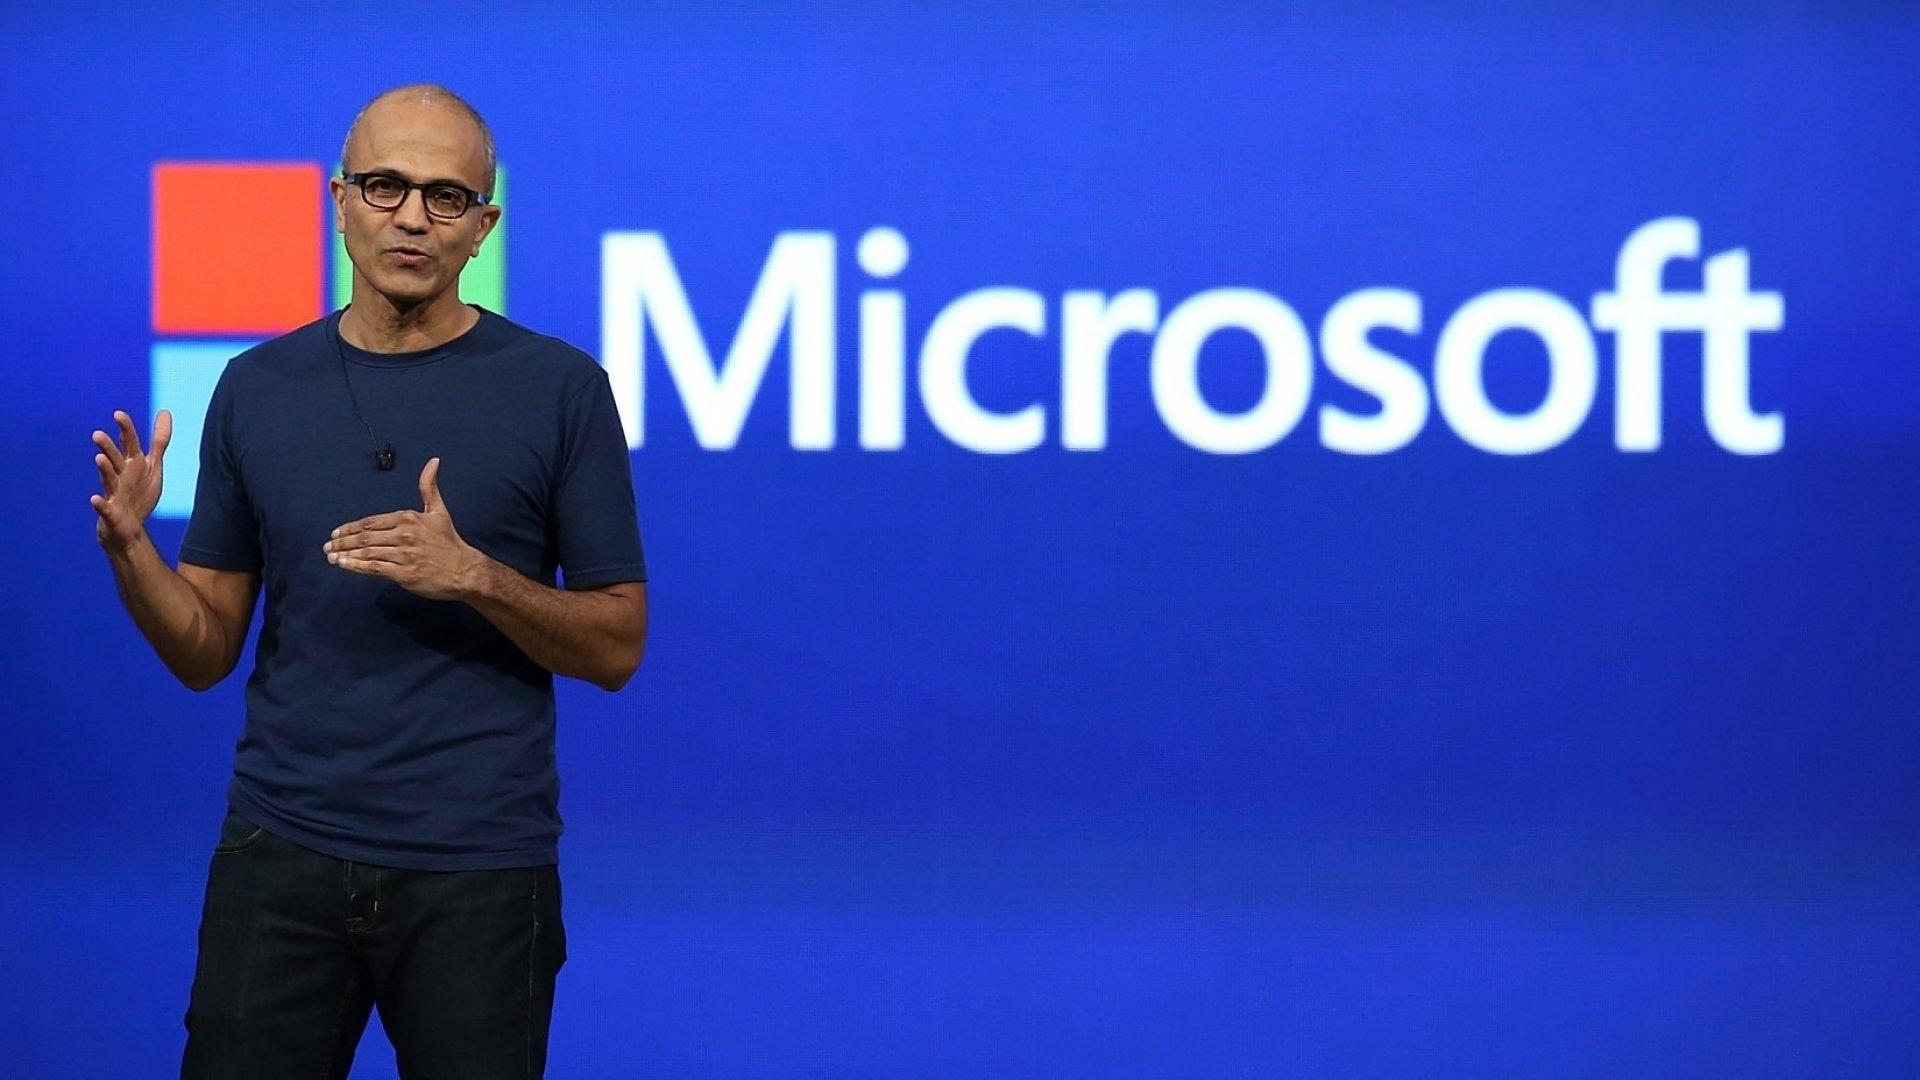 Microsoft CEO Satya Nadella Just Gave the Best Leadership Advice in 7 Words